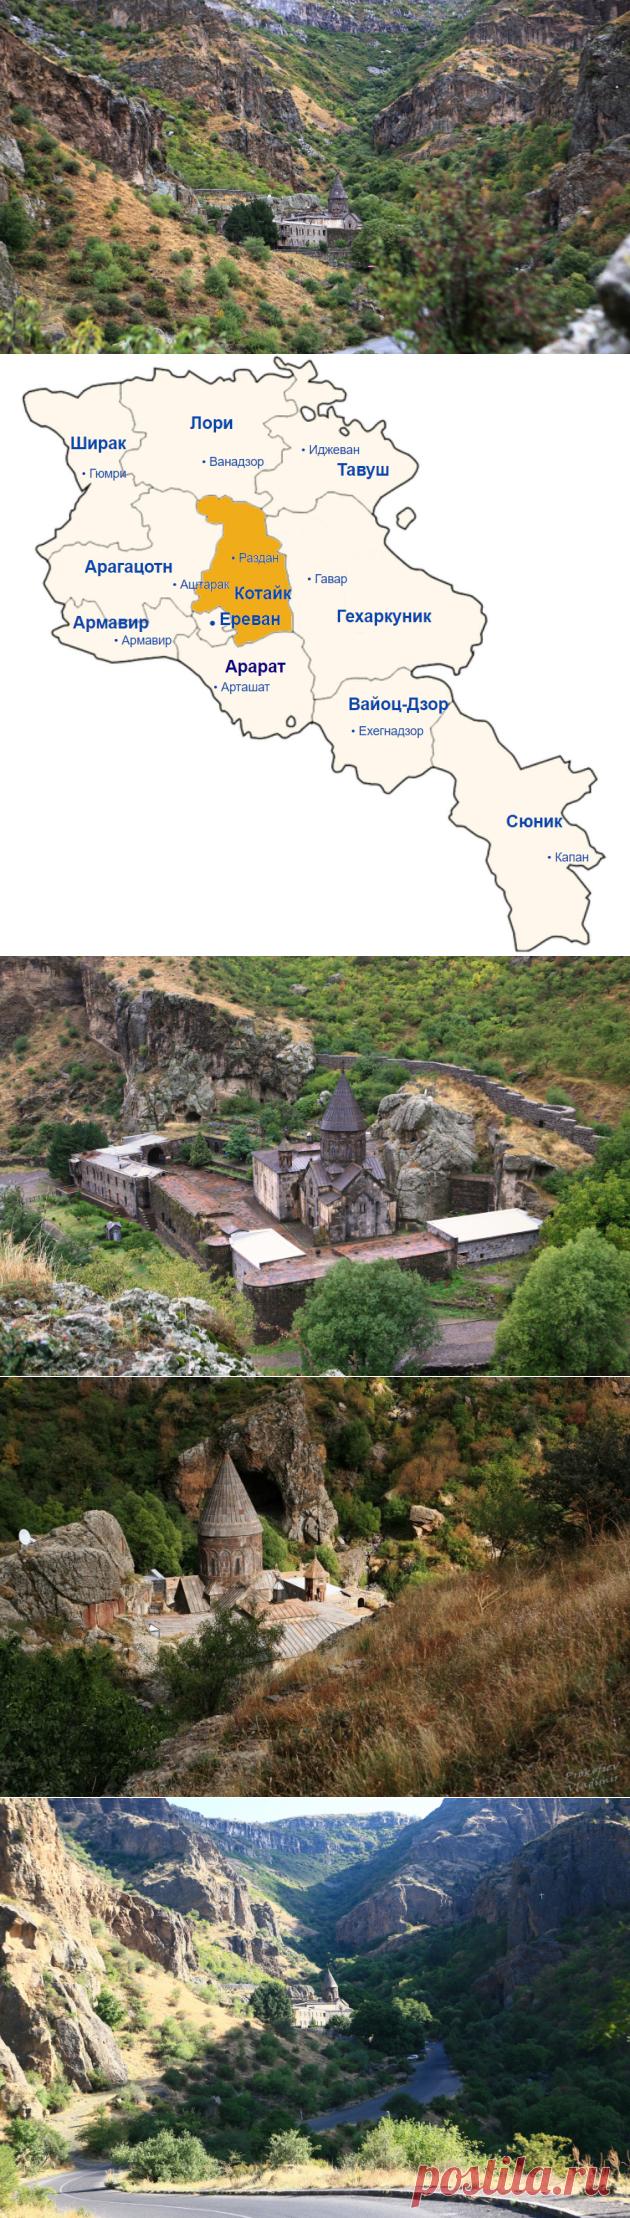 Проедемся по Армении? Гегард, Гарни и другие места недалеко от Еревана | Культура